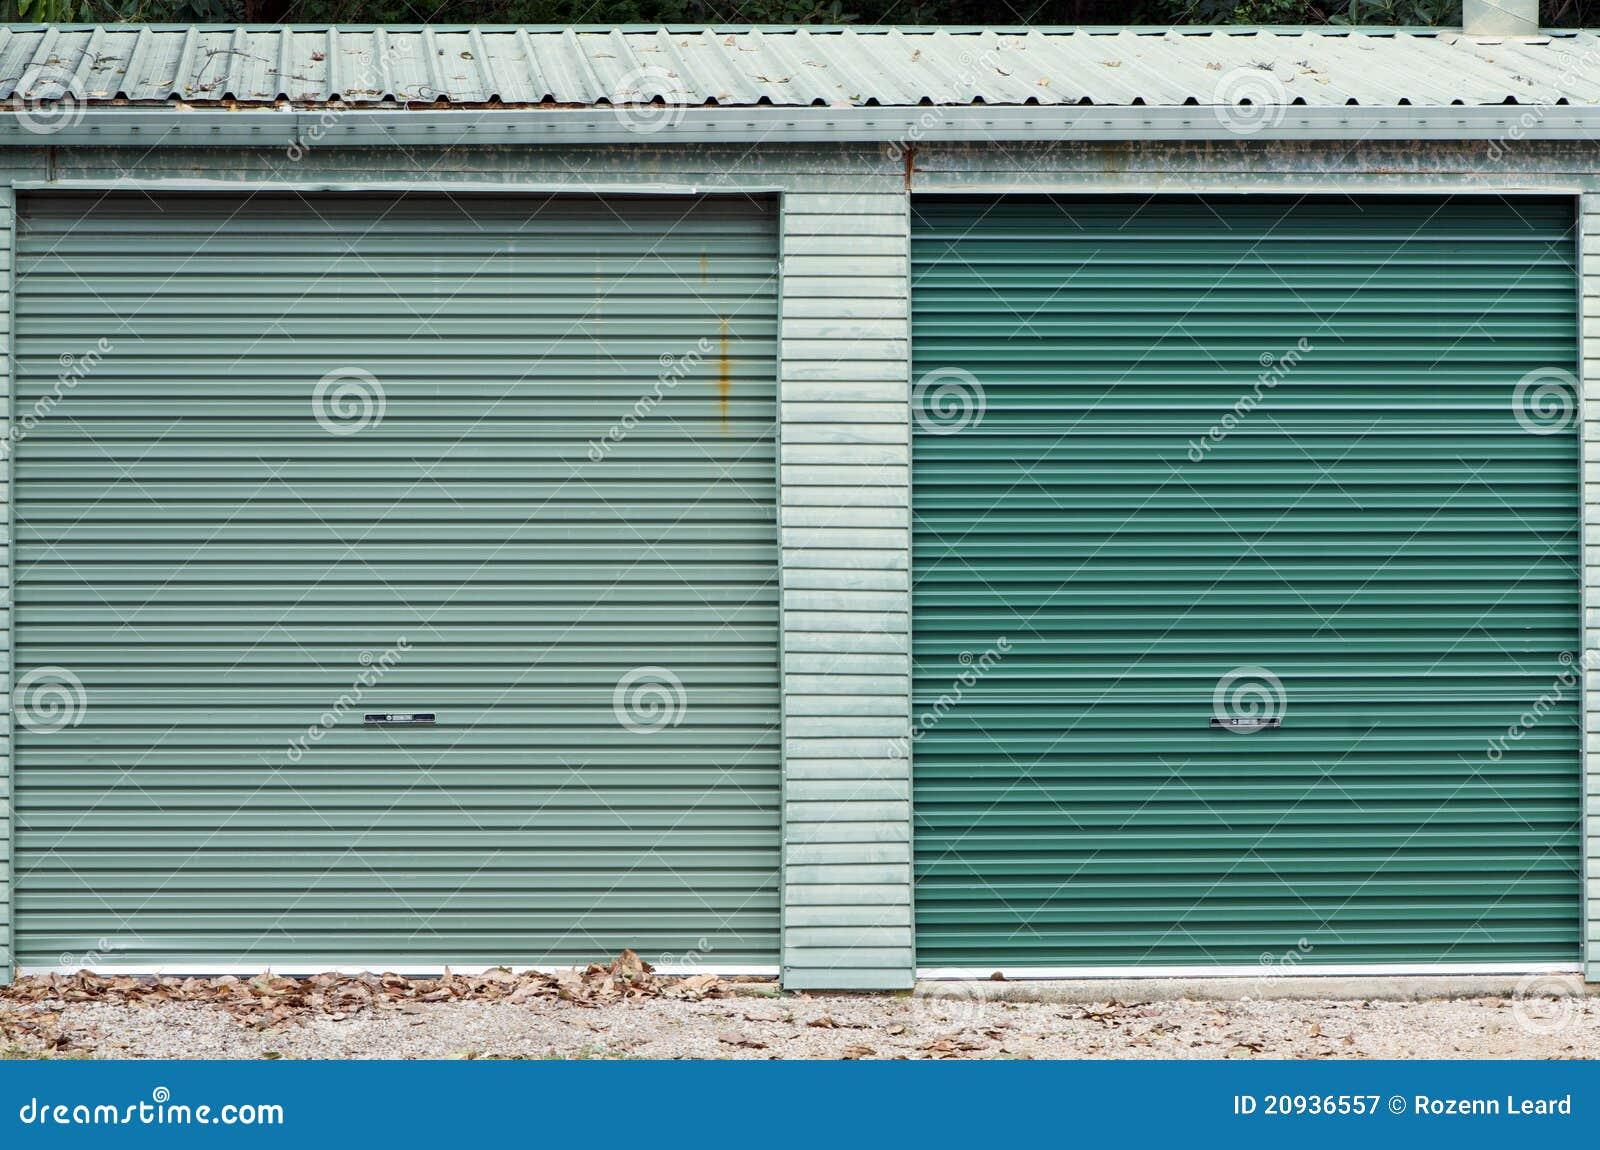 Green Garage Doors : Green garage doors royalty free stock photography image